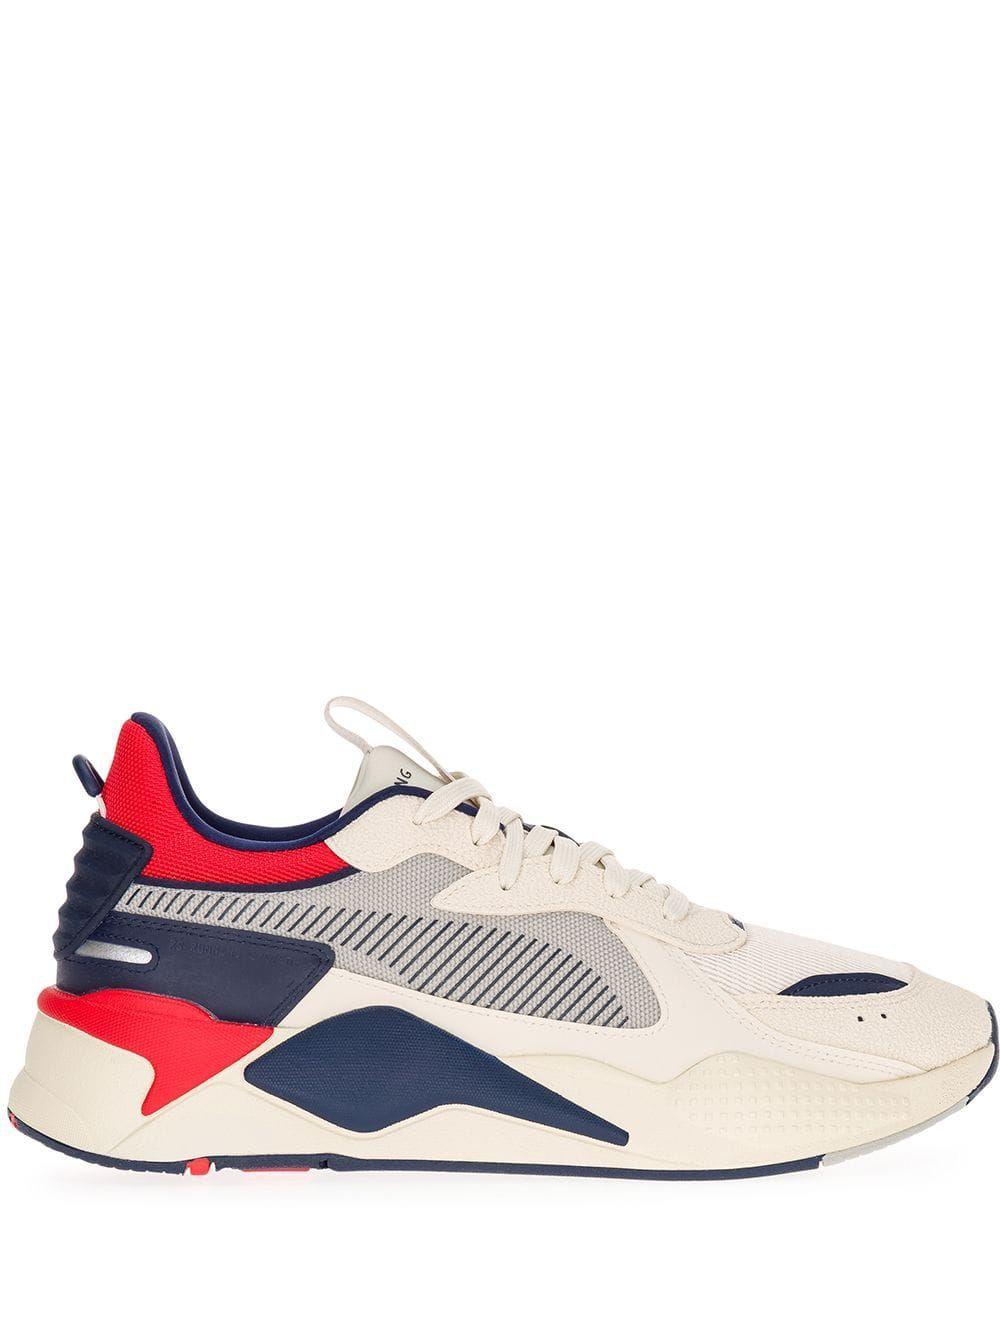 Puma RSX Hard Drive Sneakers – White